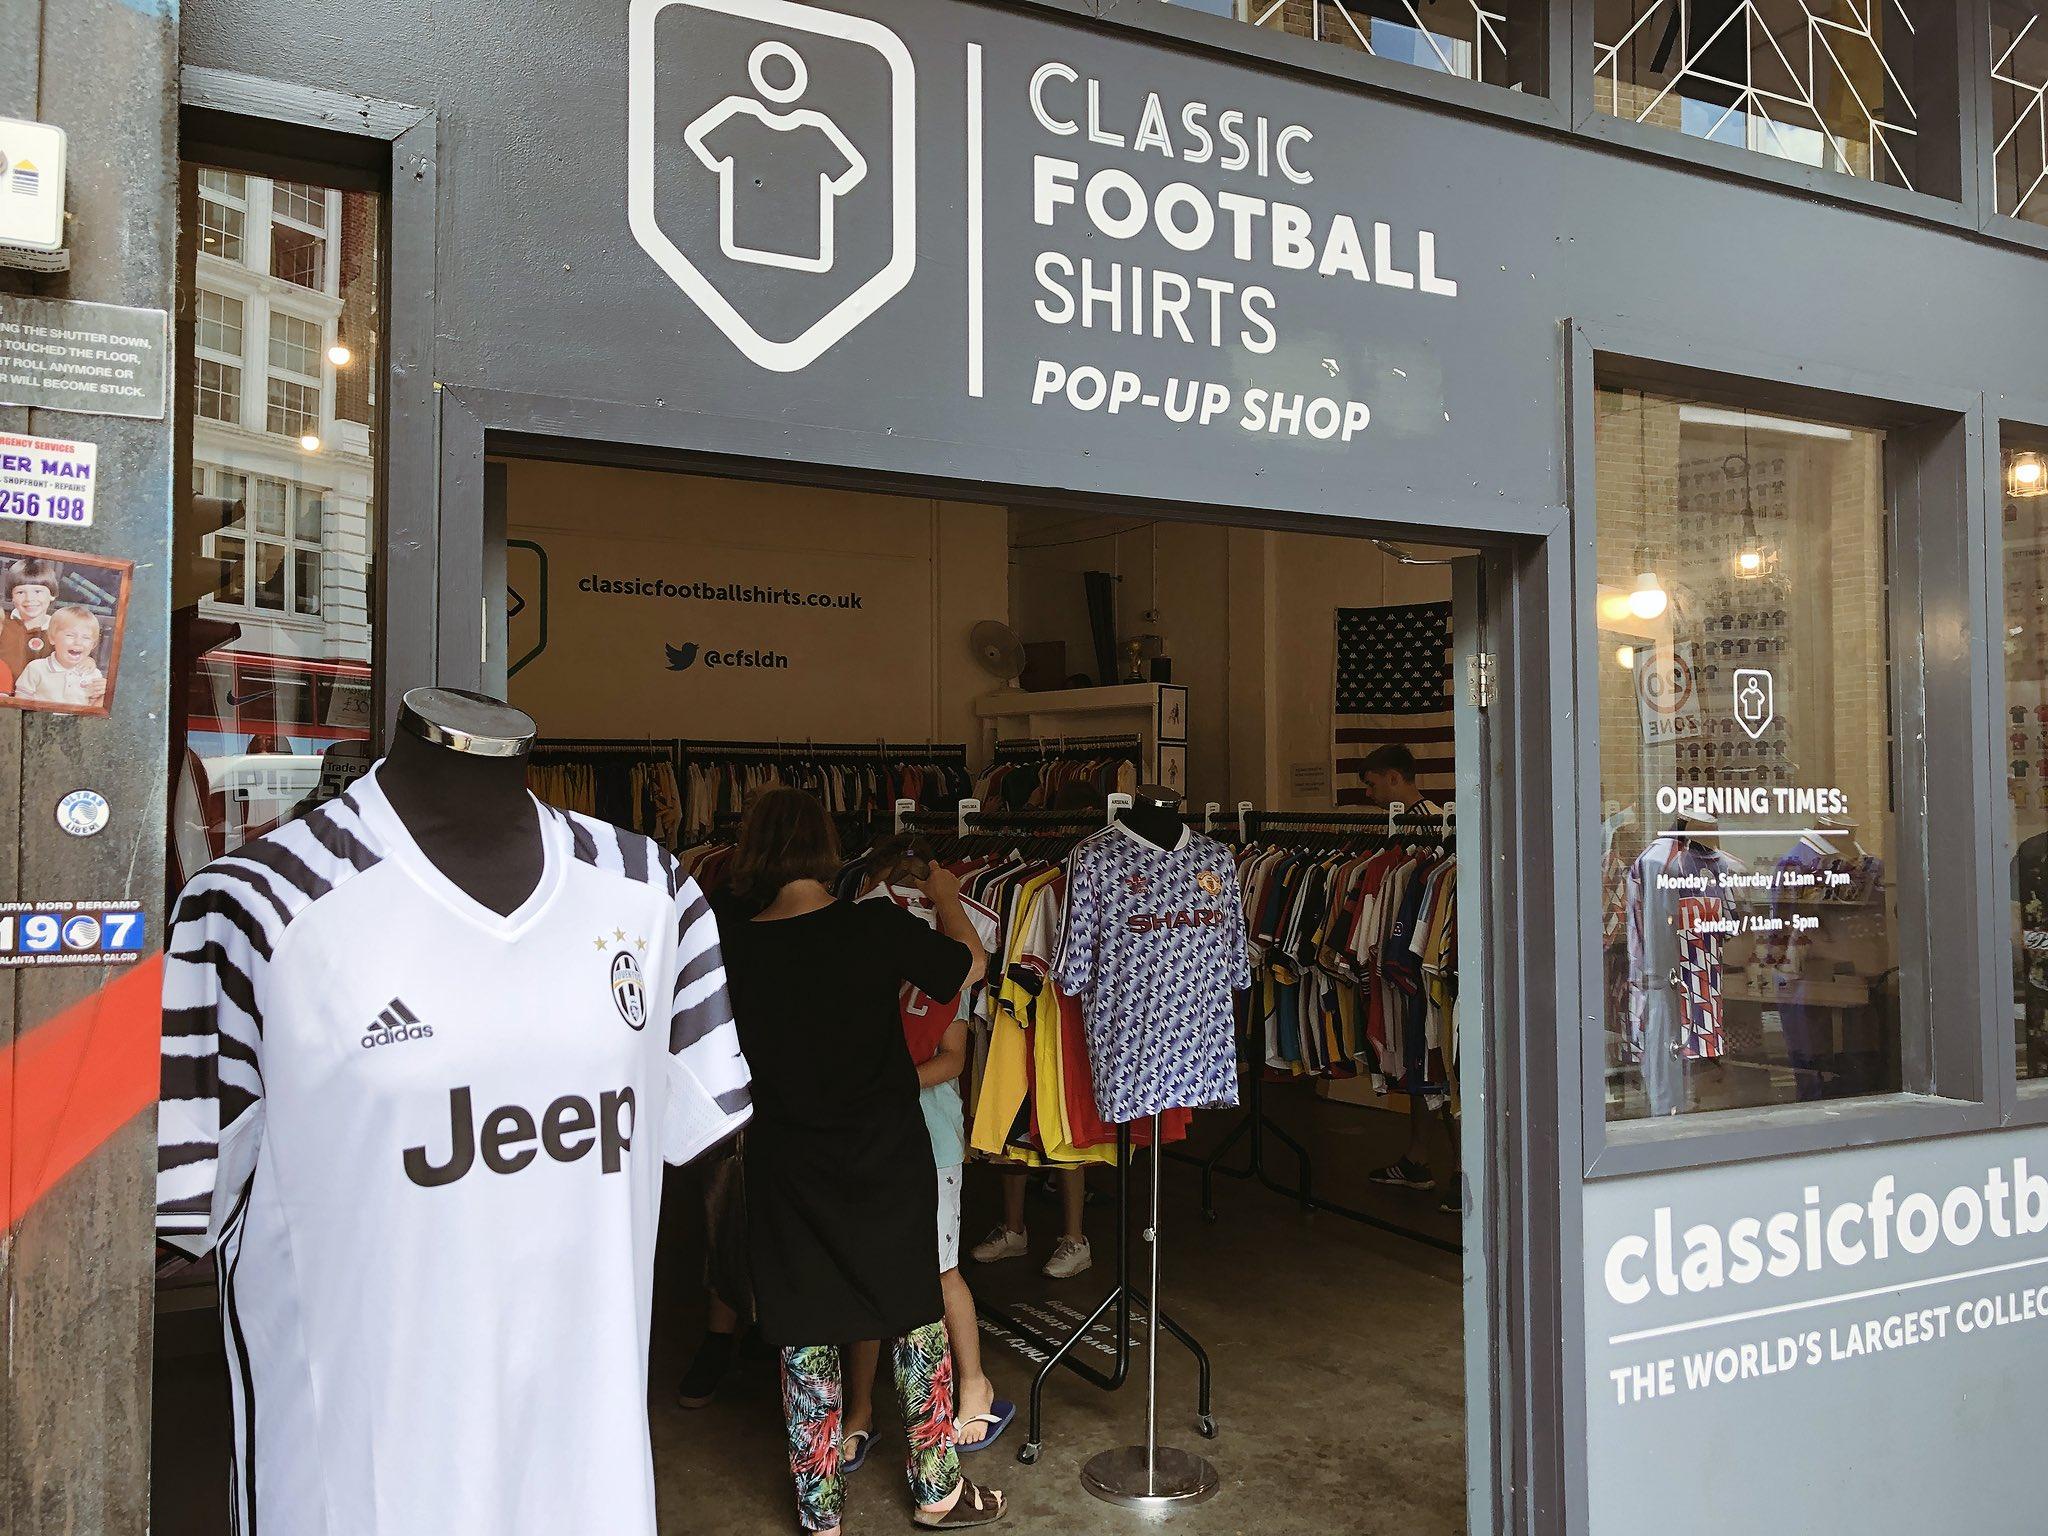 44d6d310 Retro Football T Shirts Uk - raveitsafe